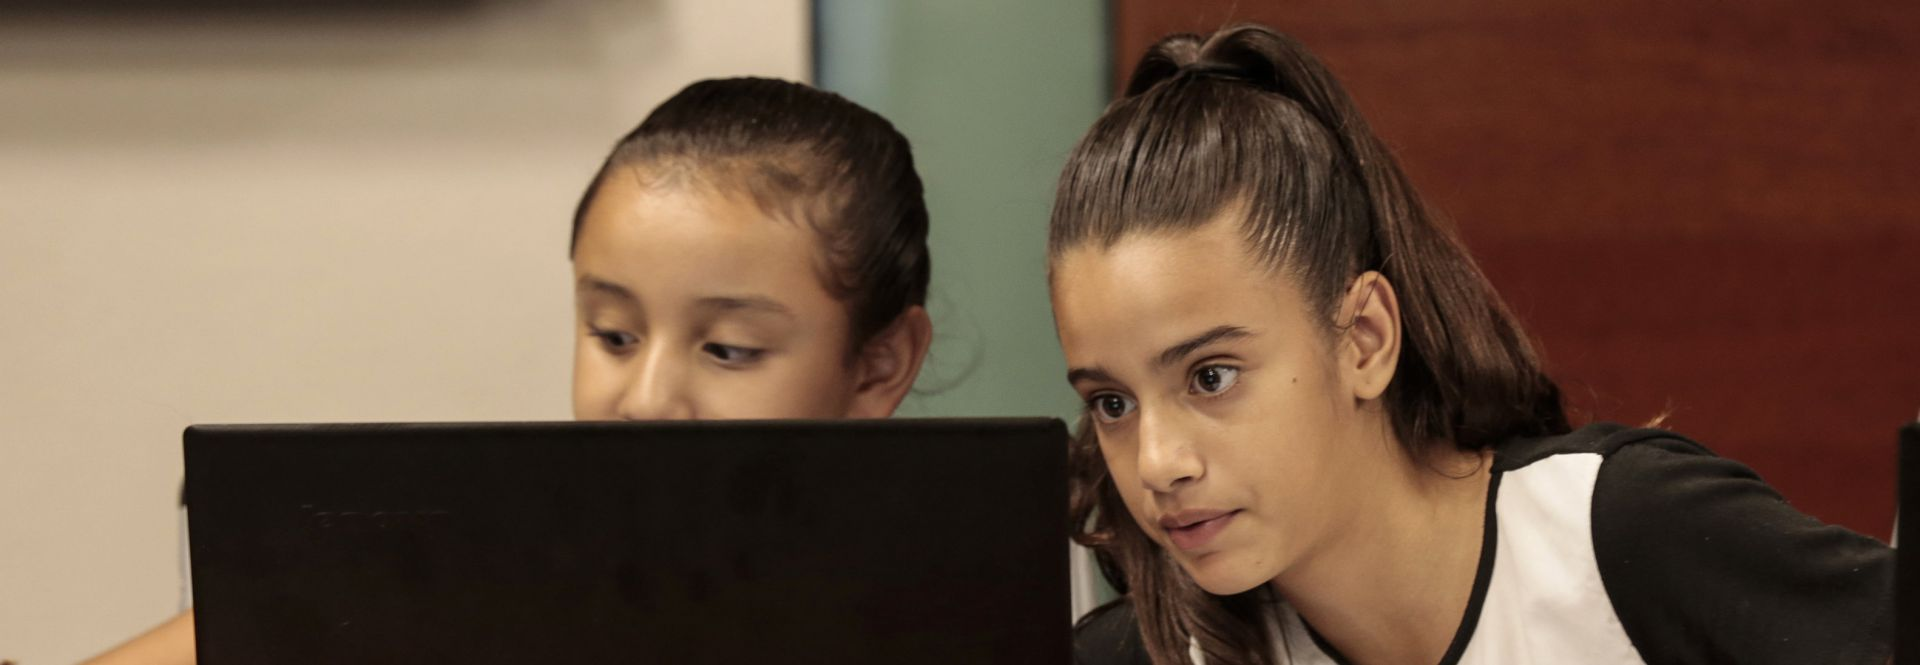 ¡Queremos niñas ingenieras! EFE Mexico